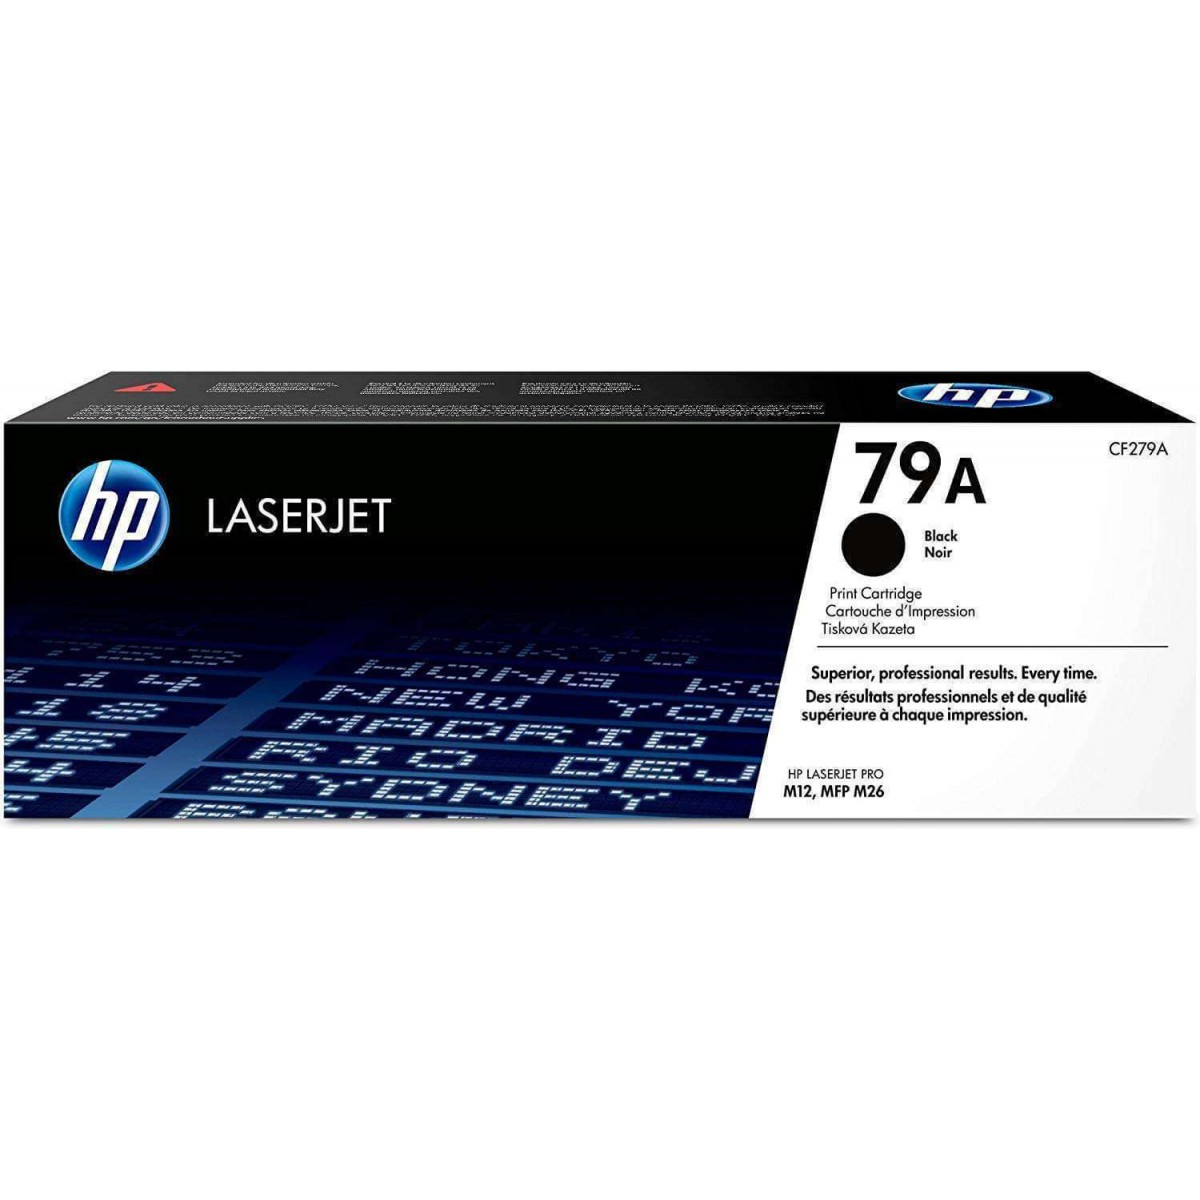 Cartucho de Tóner Original HP LaserJet 79A Negro